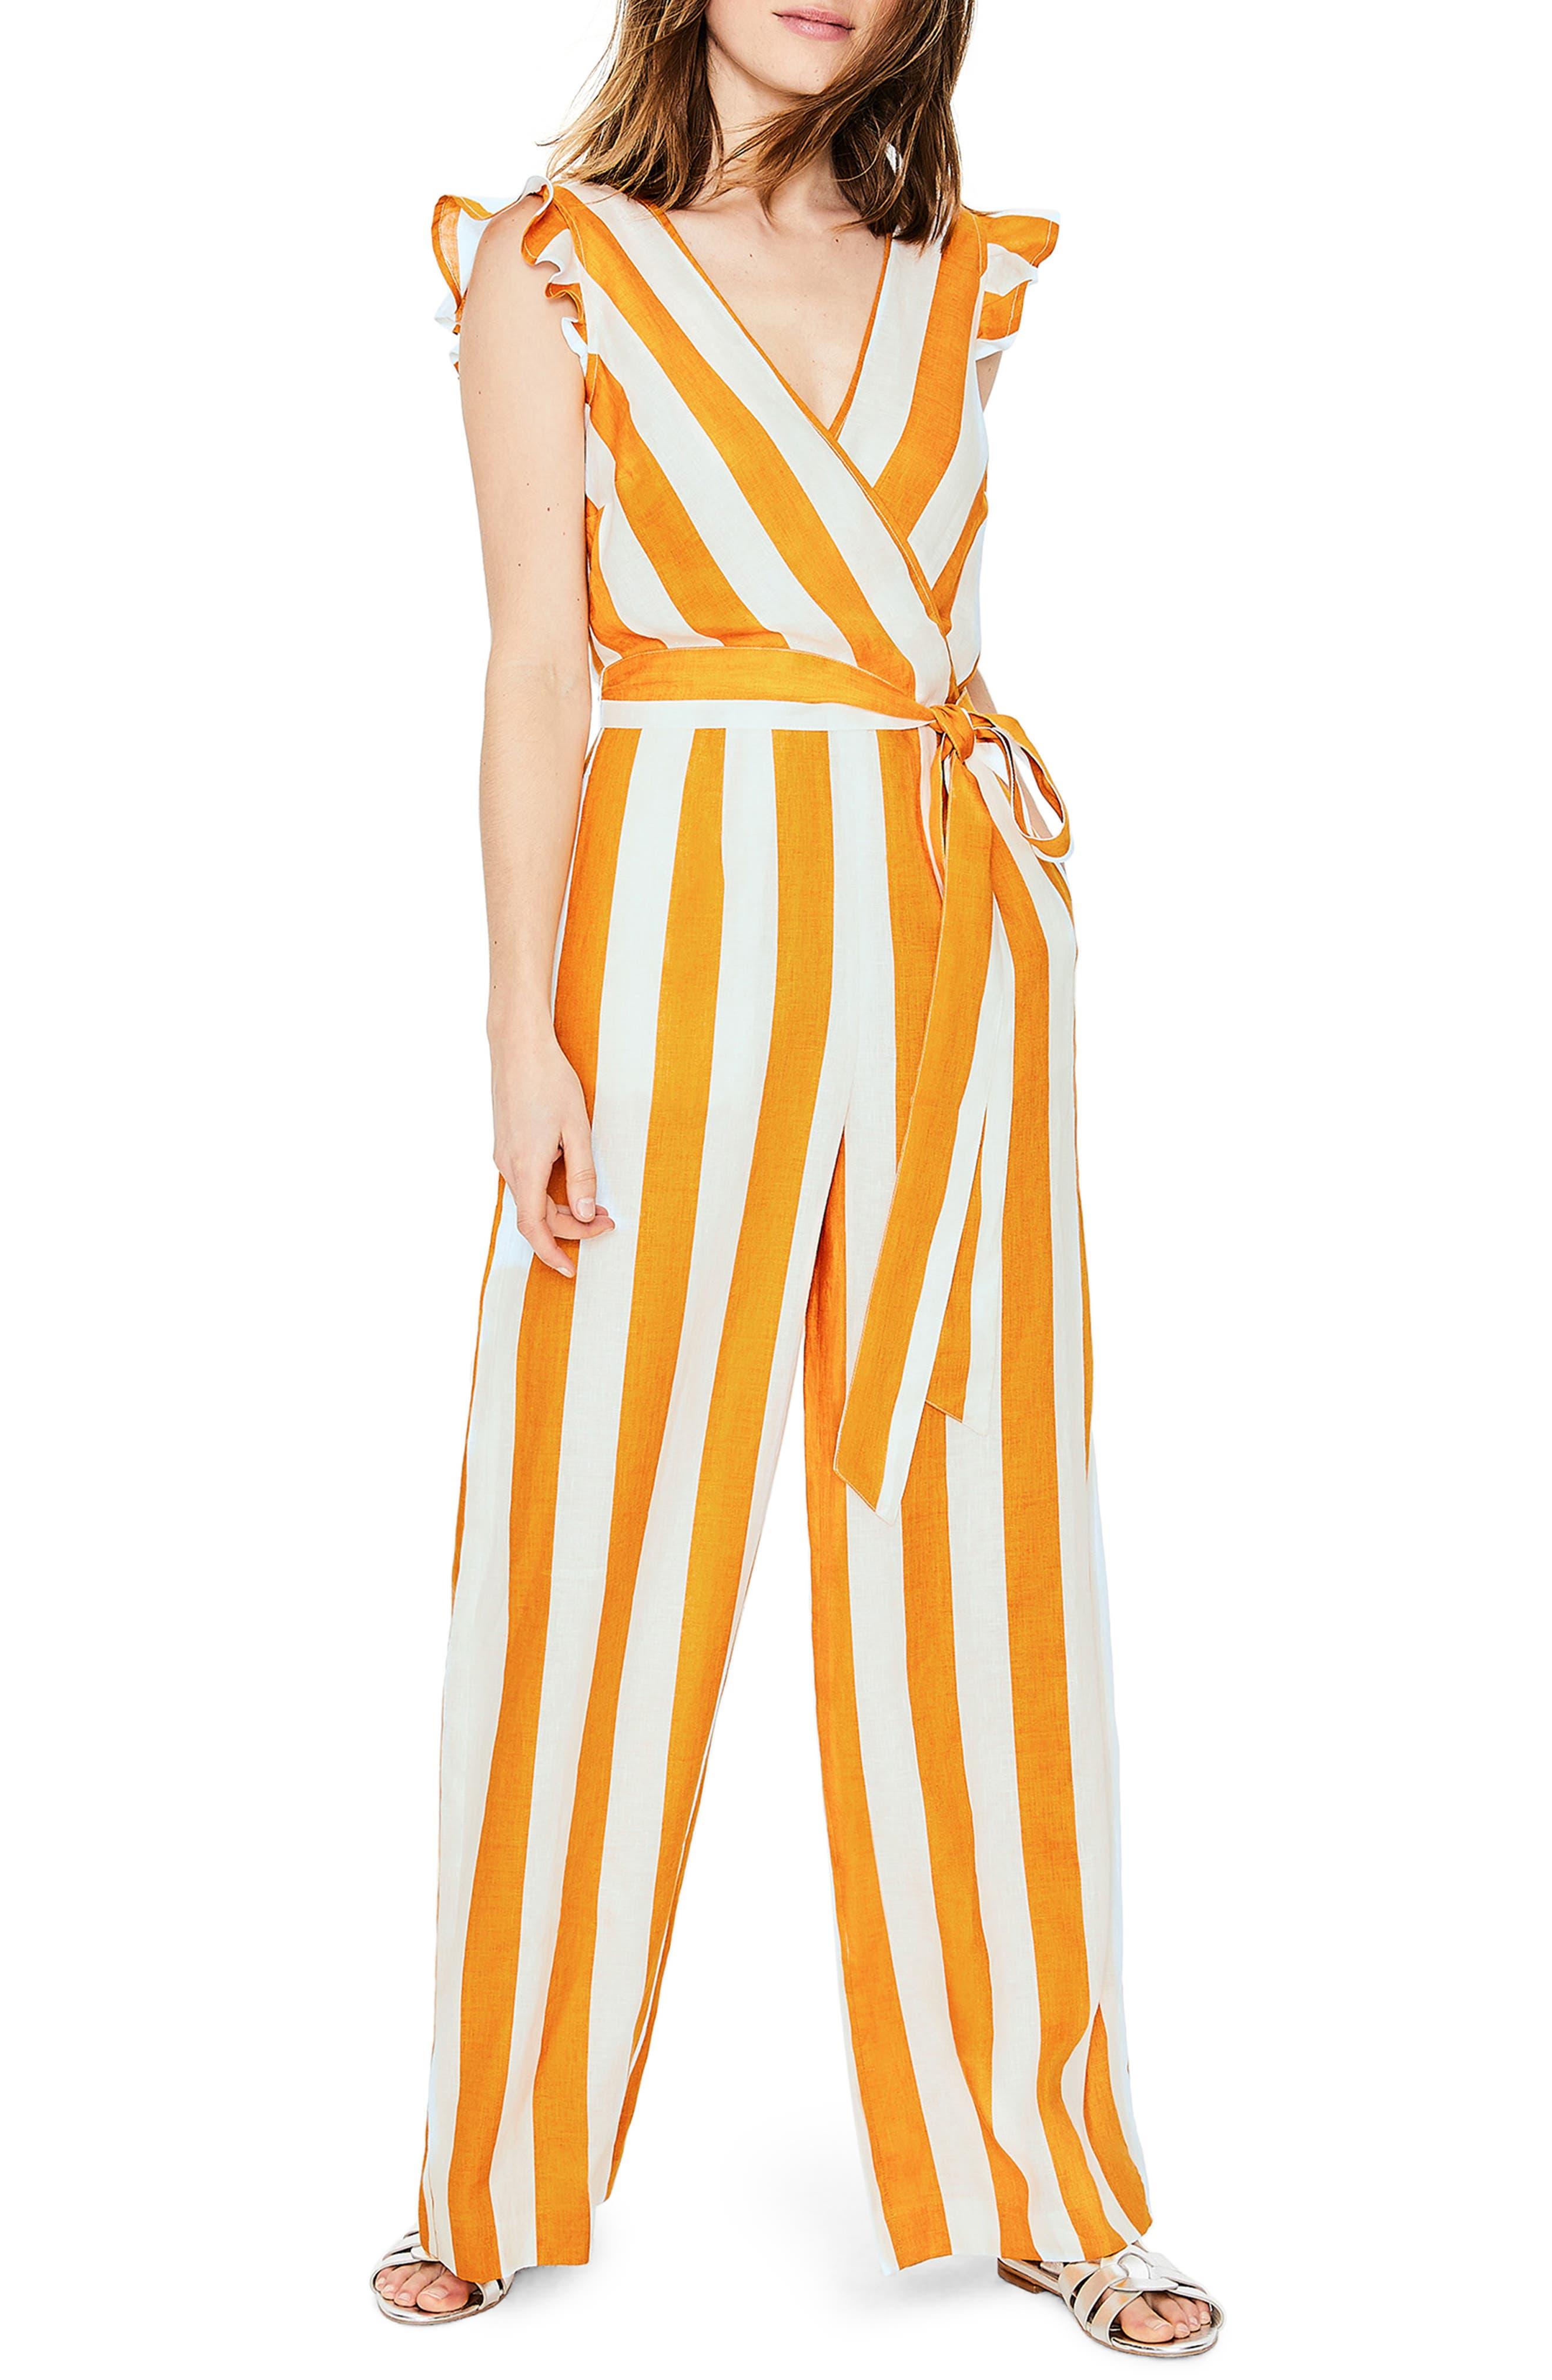 Petite Boden Mila Stripe Linen Jumpsuit, Yellow